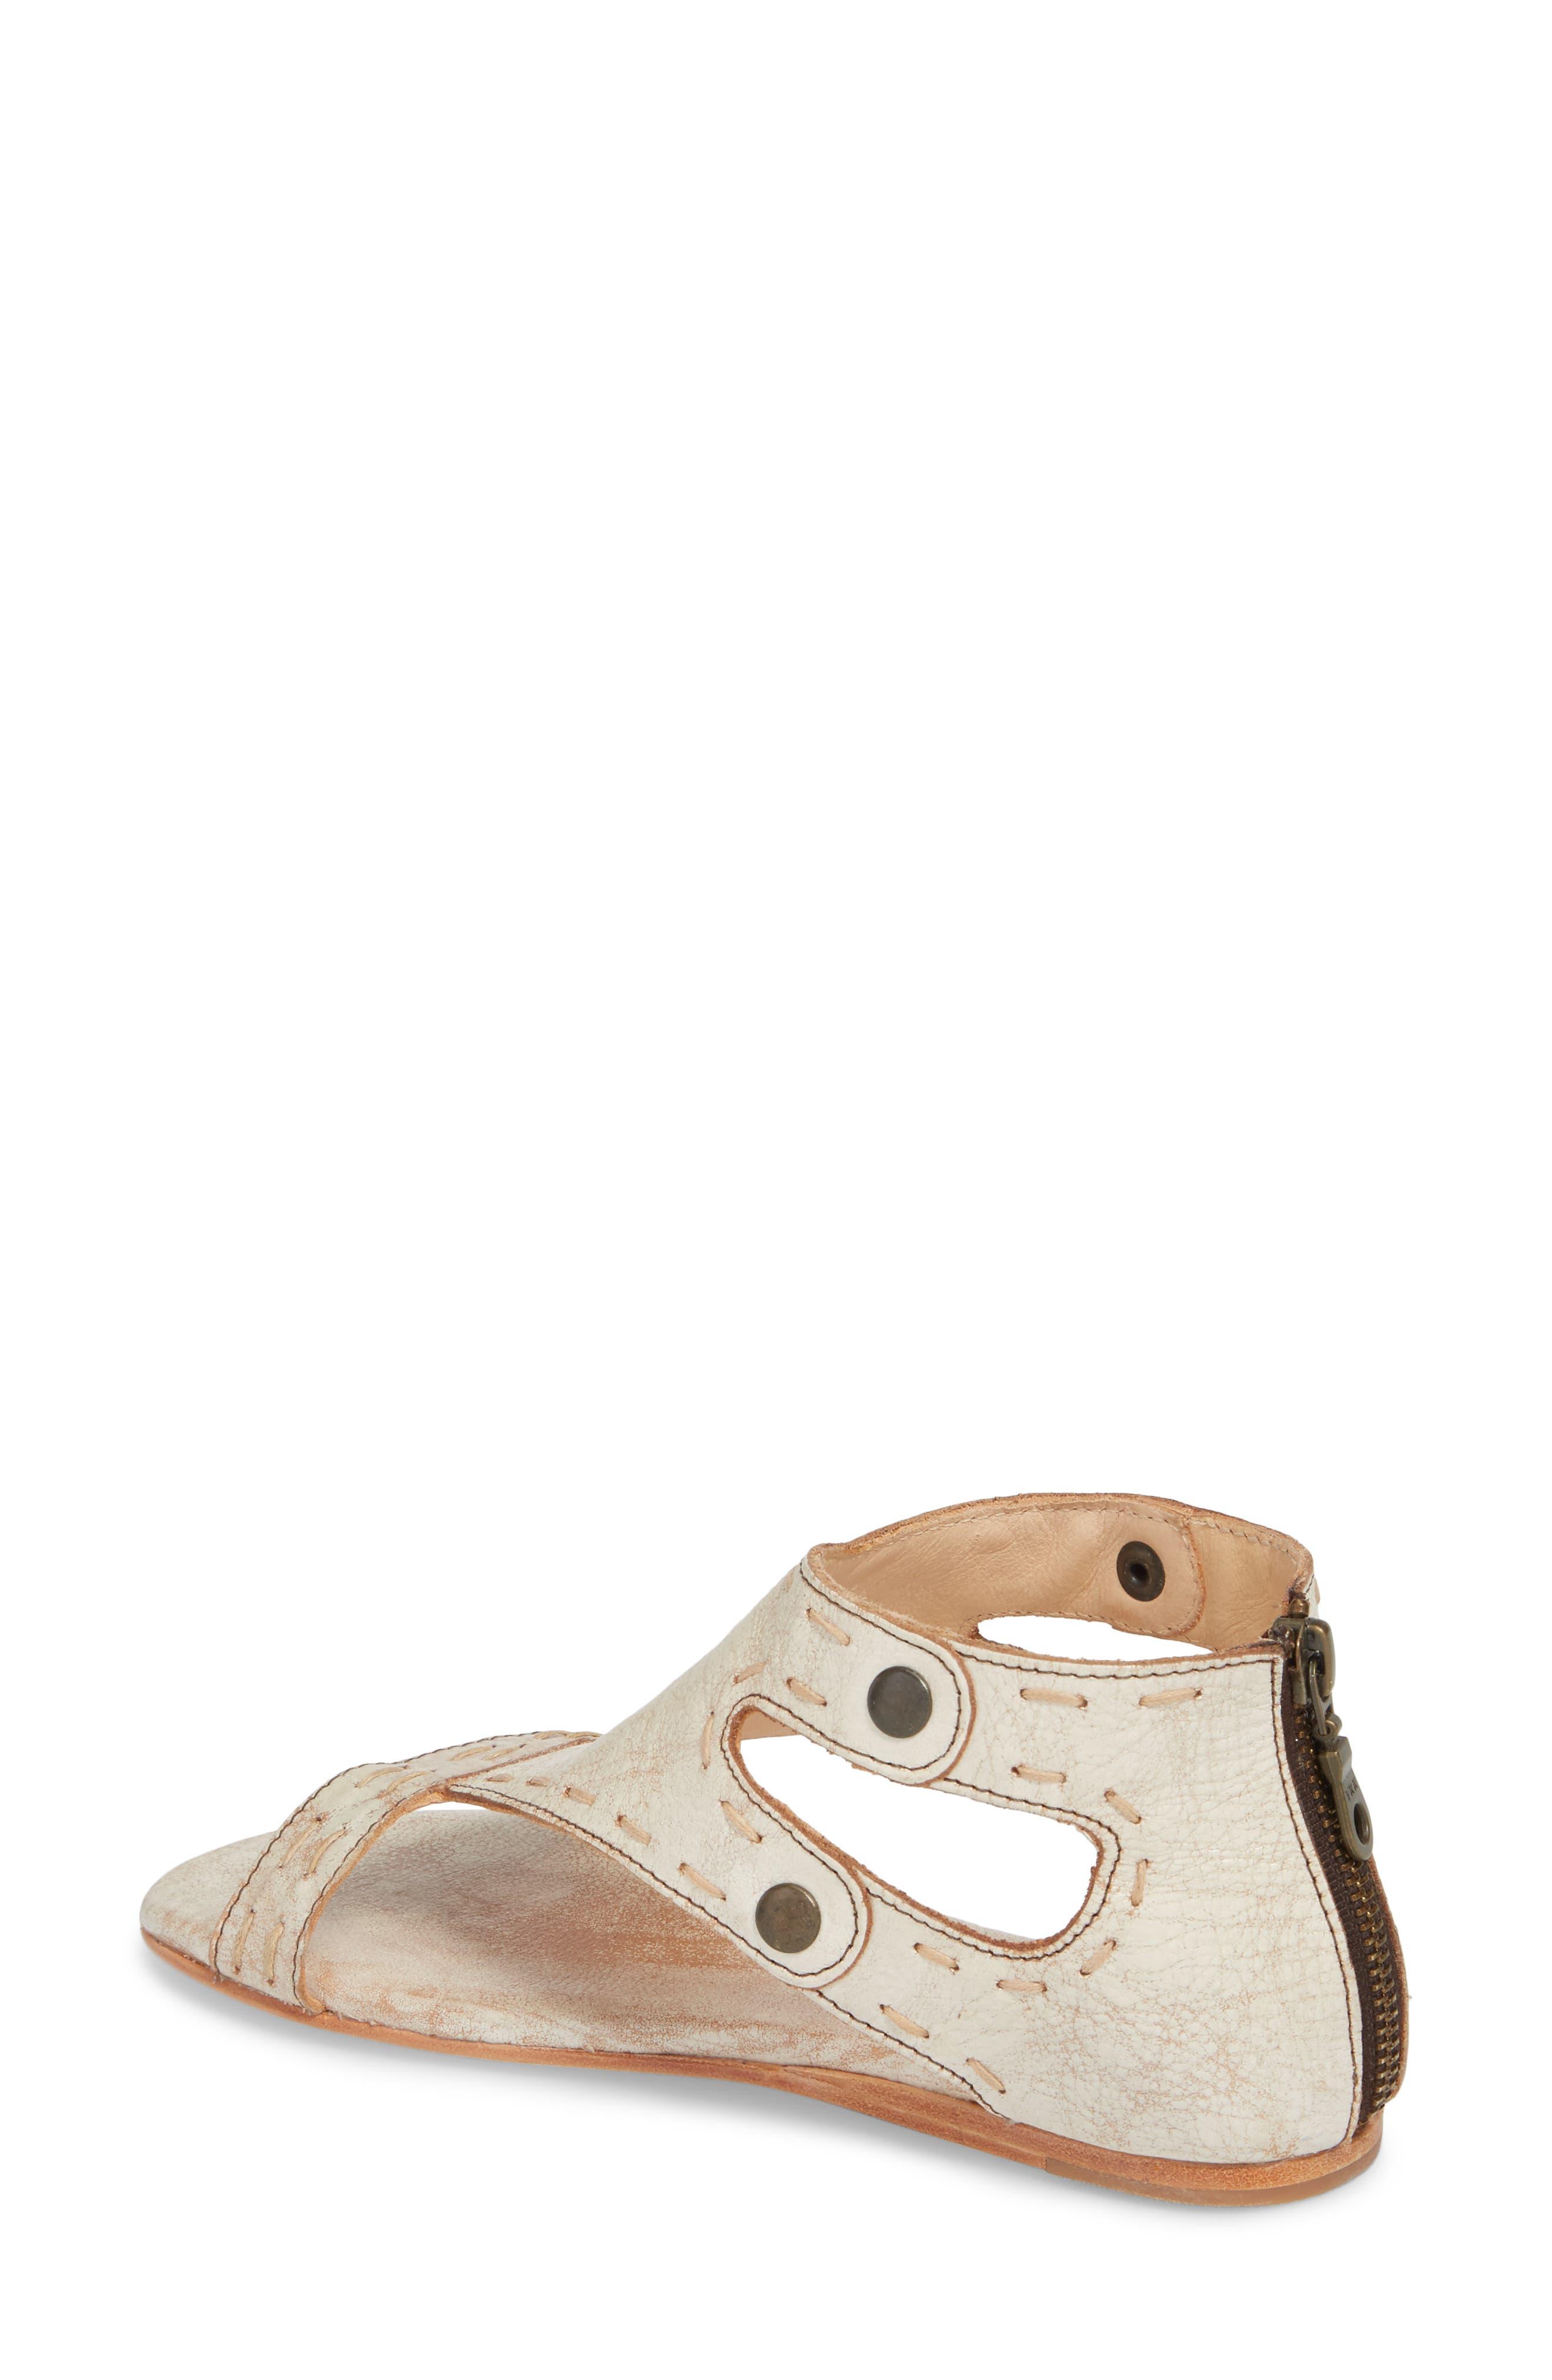 Soto Sandal,                             Alternate thumbnail 2, color,                             Nectar Leather